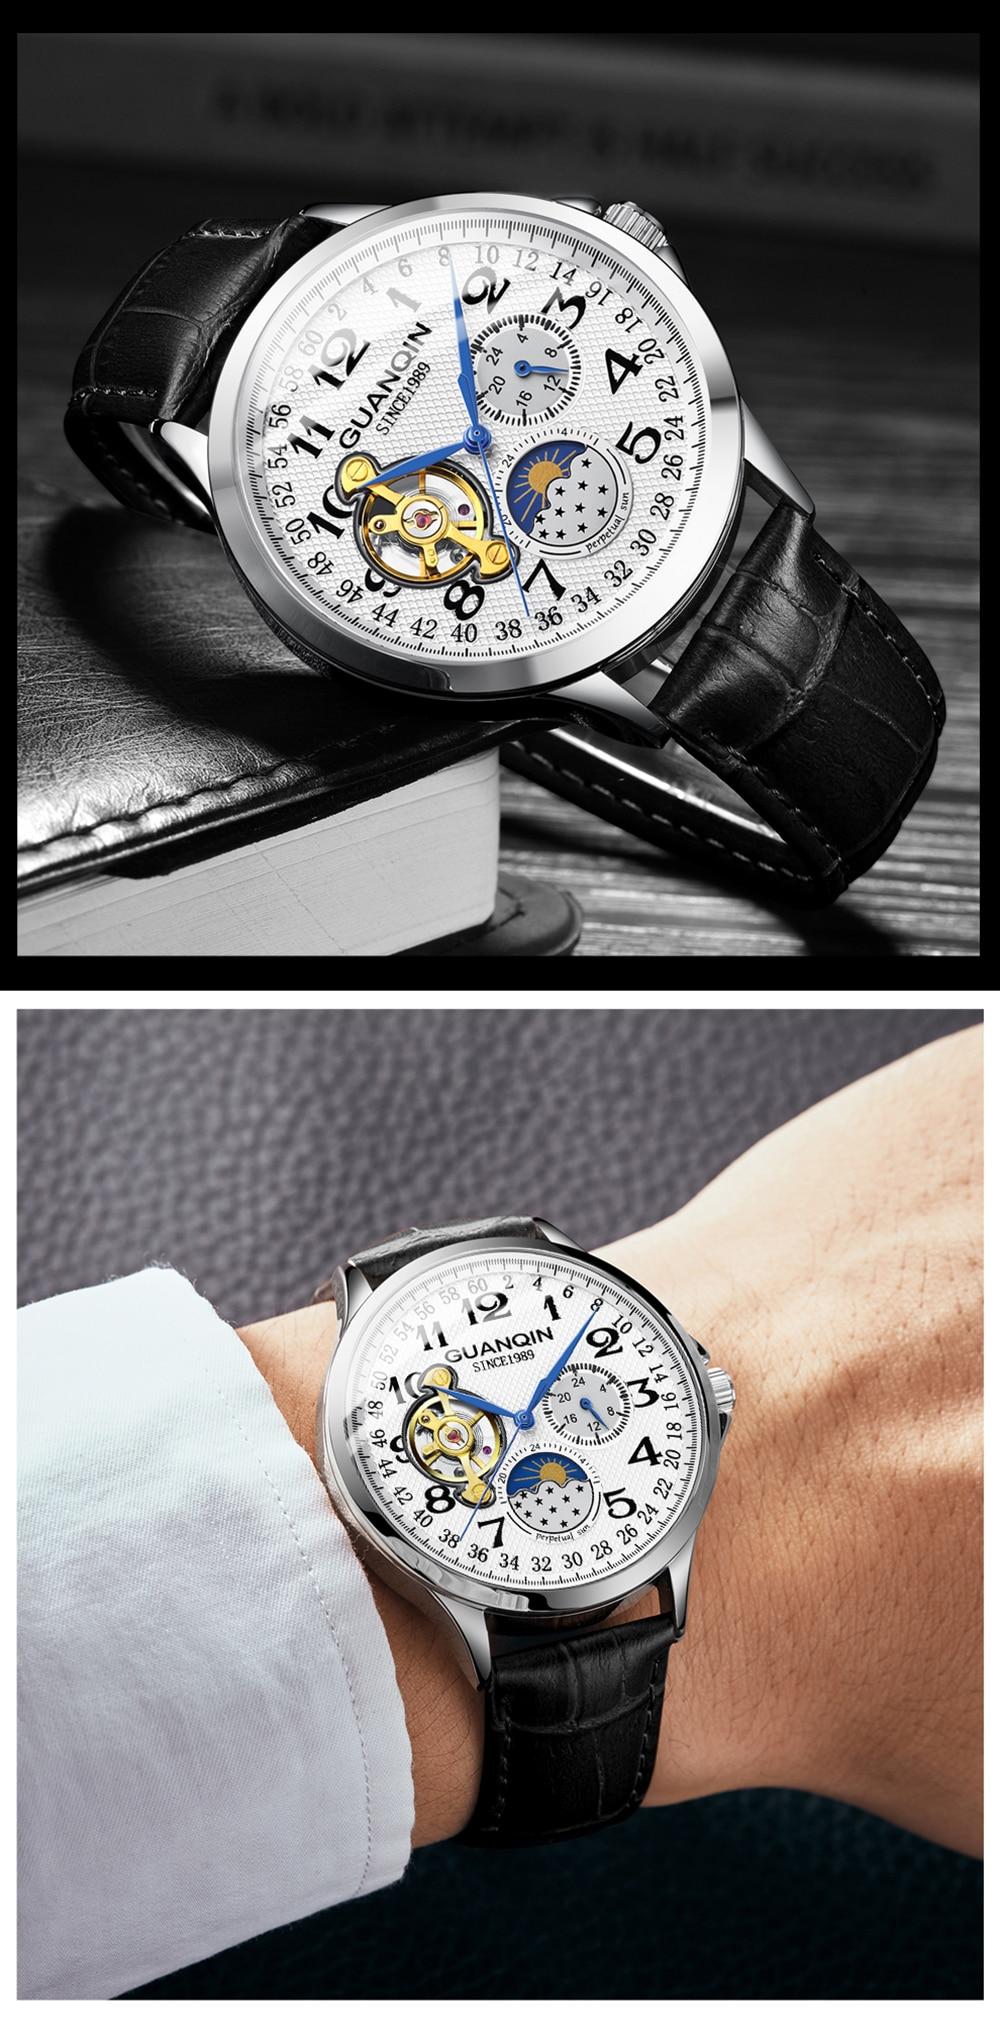 HTB1bOH3XROD3KVjSZFFq6An9pXap GUANQIN mechanical watch men waterproof automatic skeleton tourbillon clock men business top brand luxury Relogio Masculino